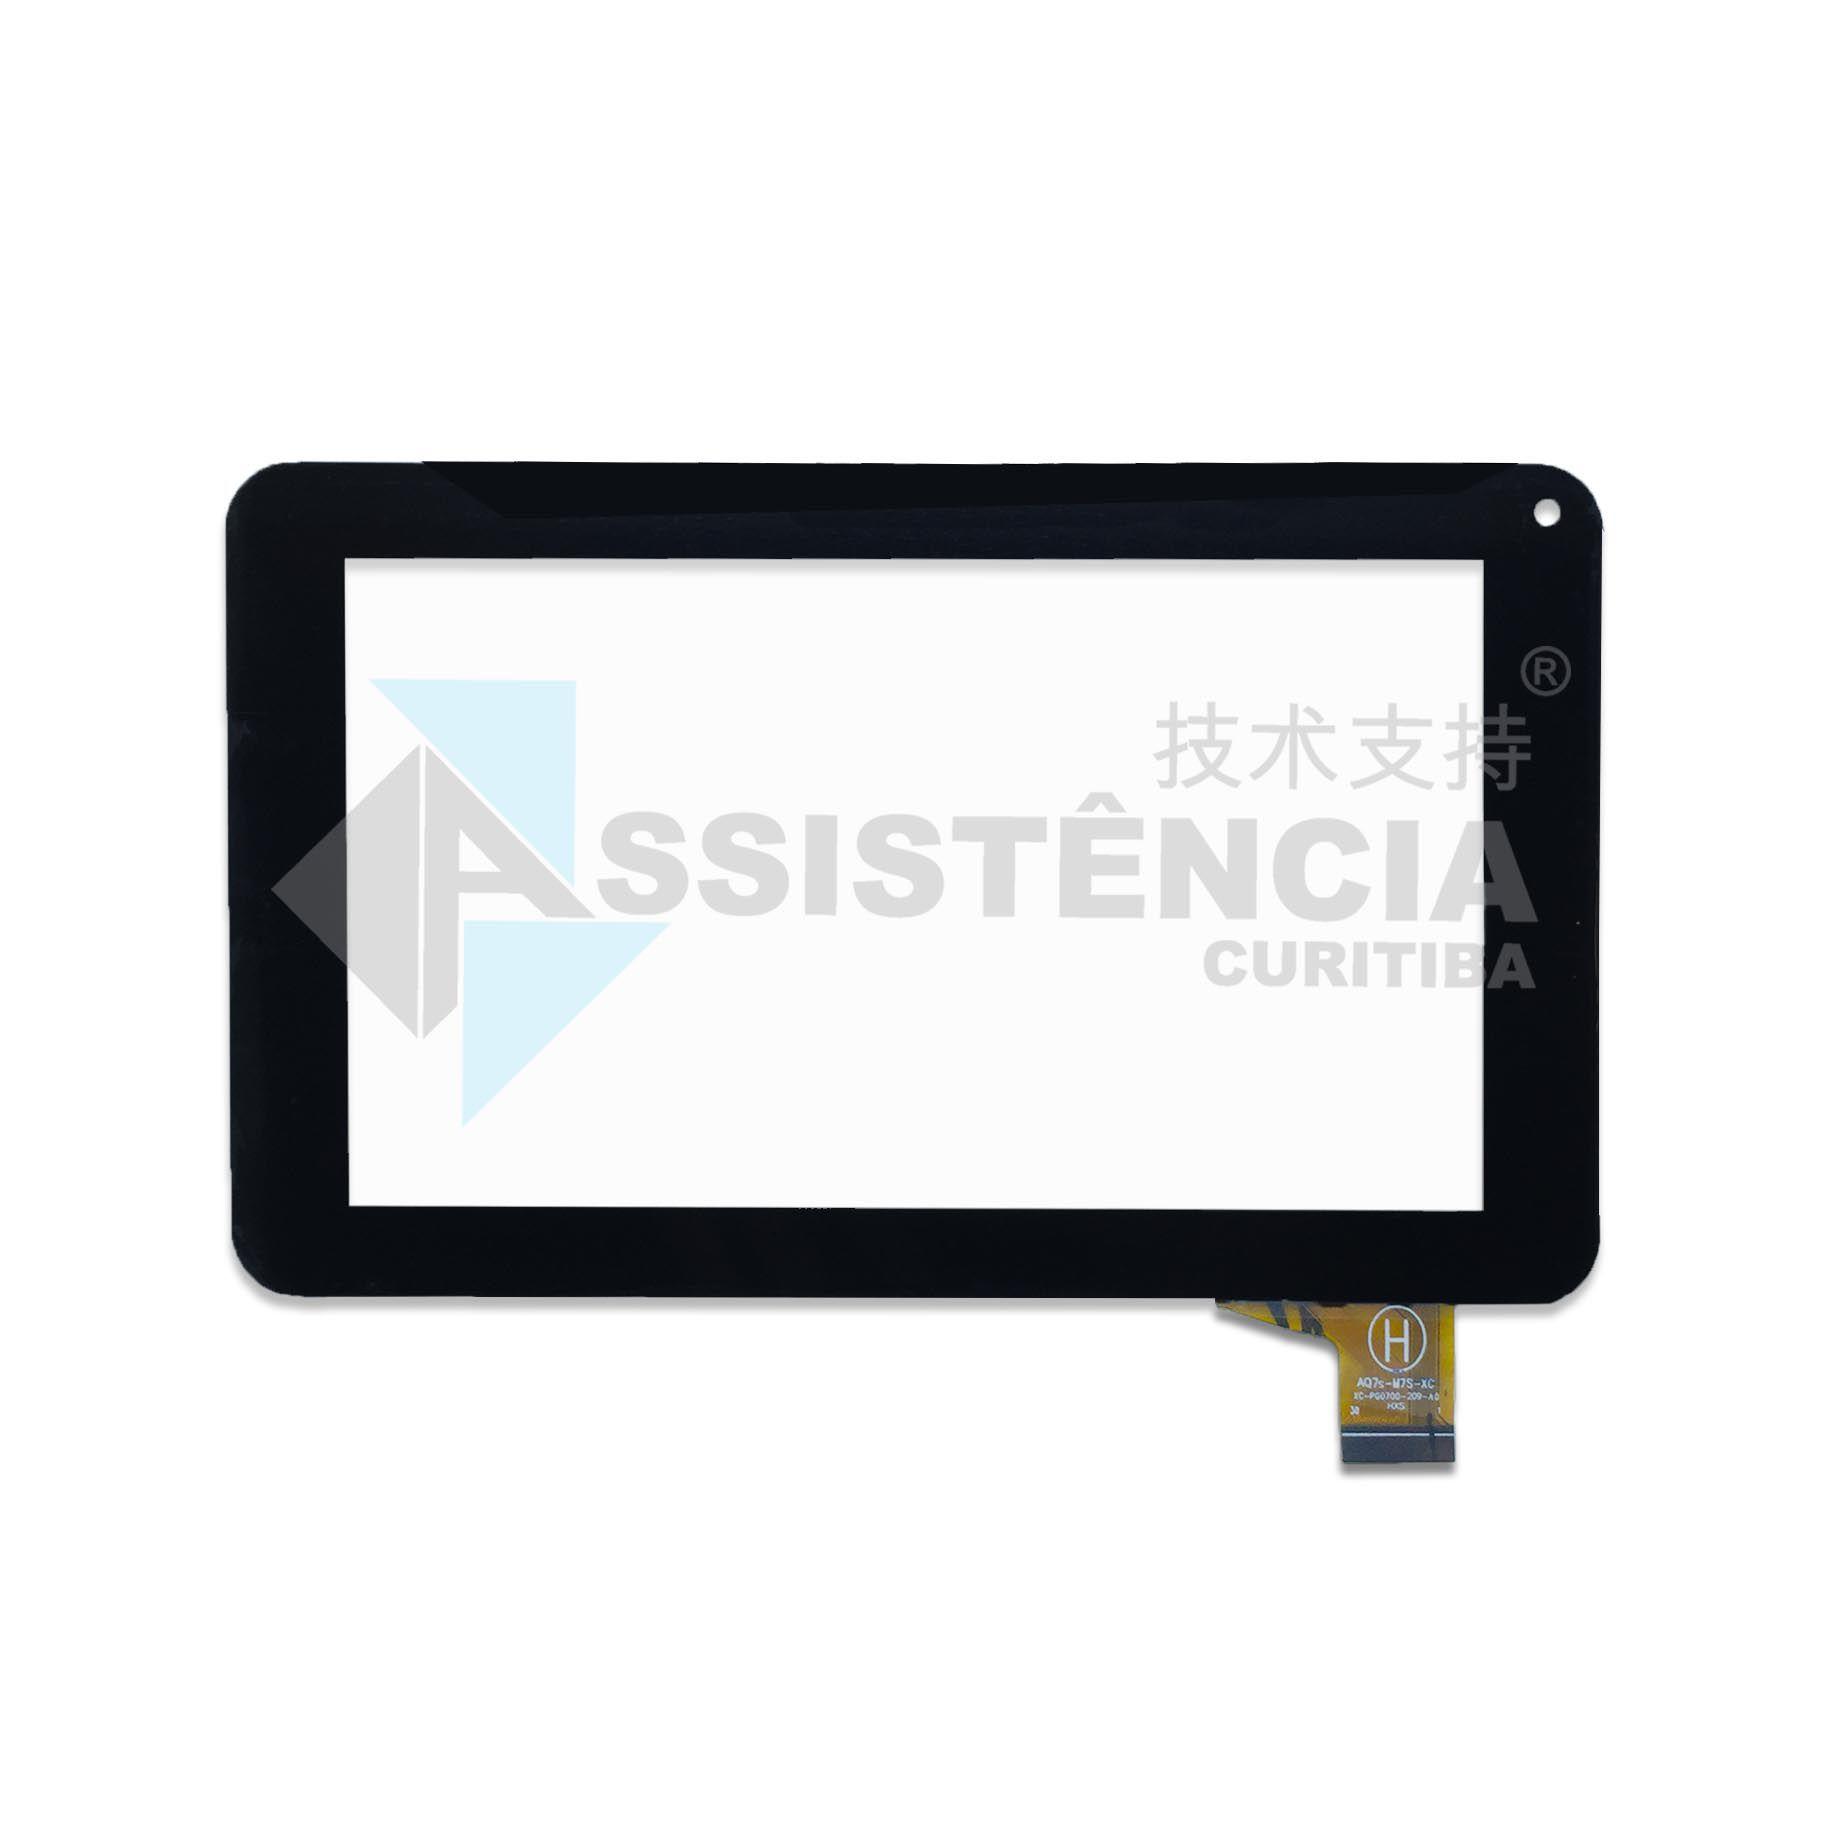 Tela Touch Bak Ibak 7301 Preto